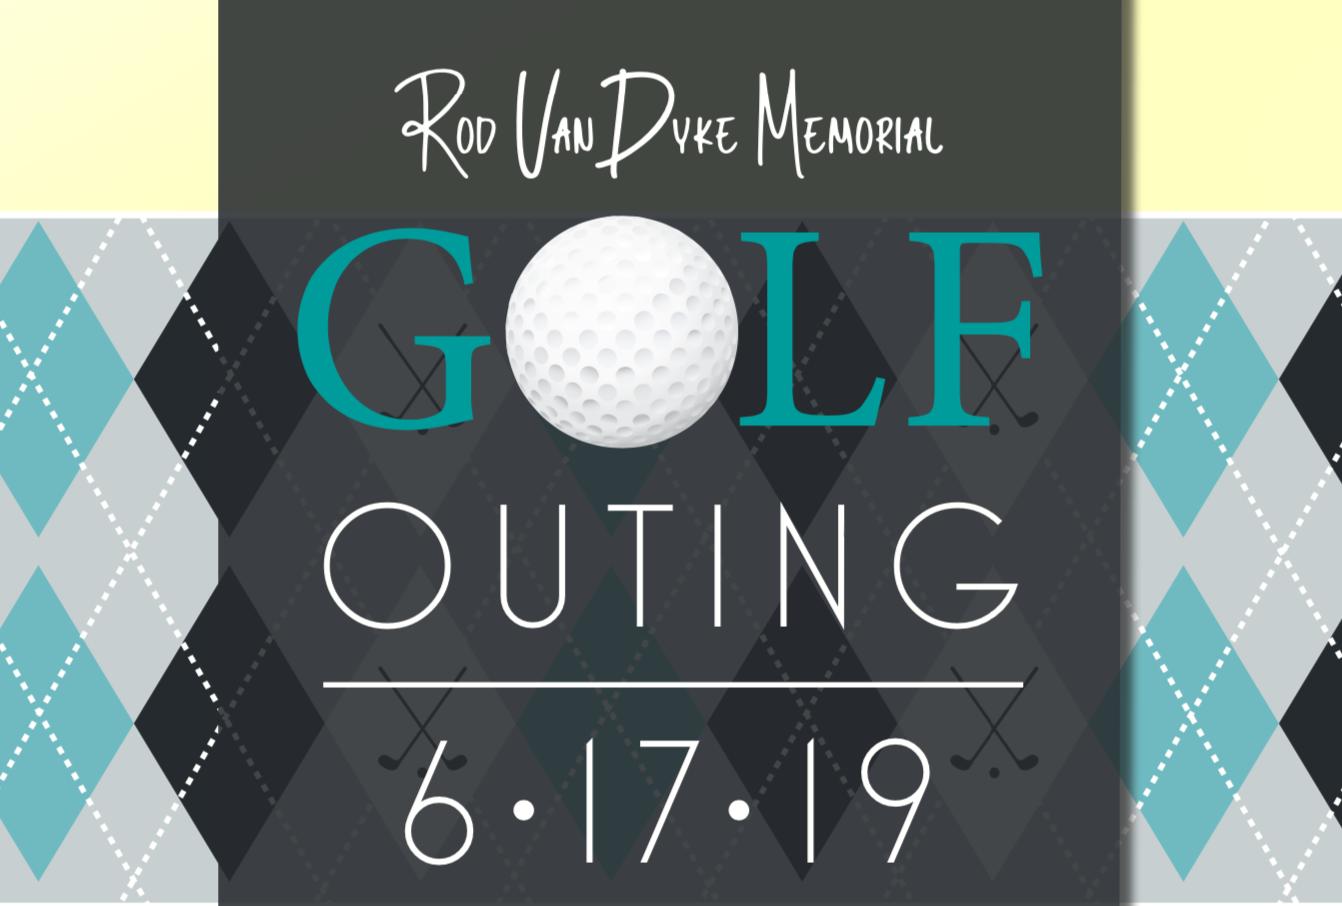 Registration Now Open – Rod VanDyke Memorial Golf Outing